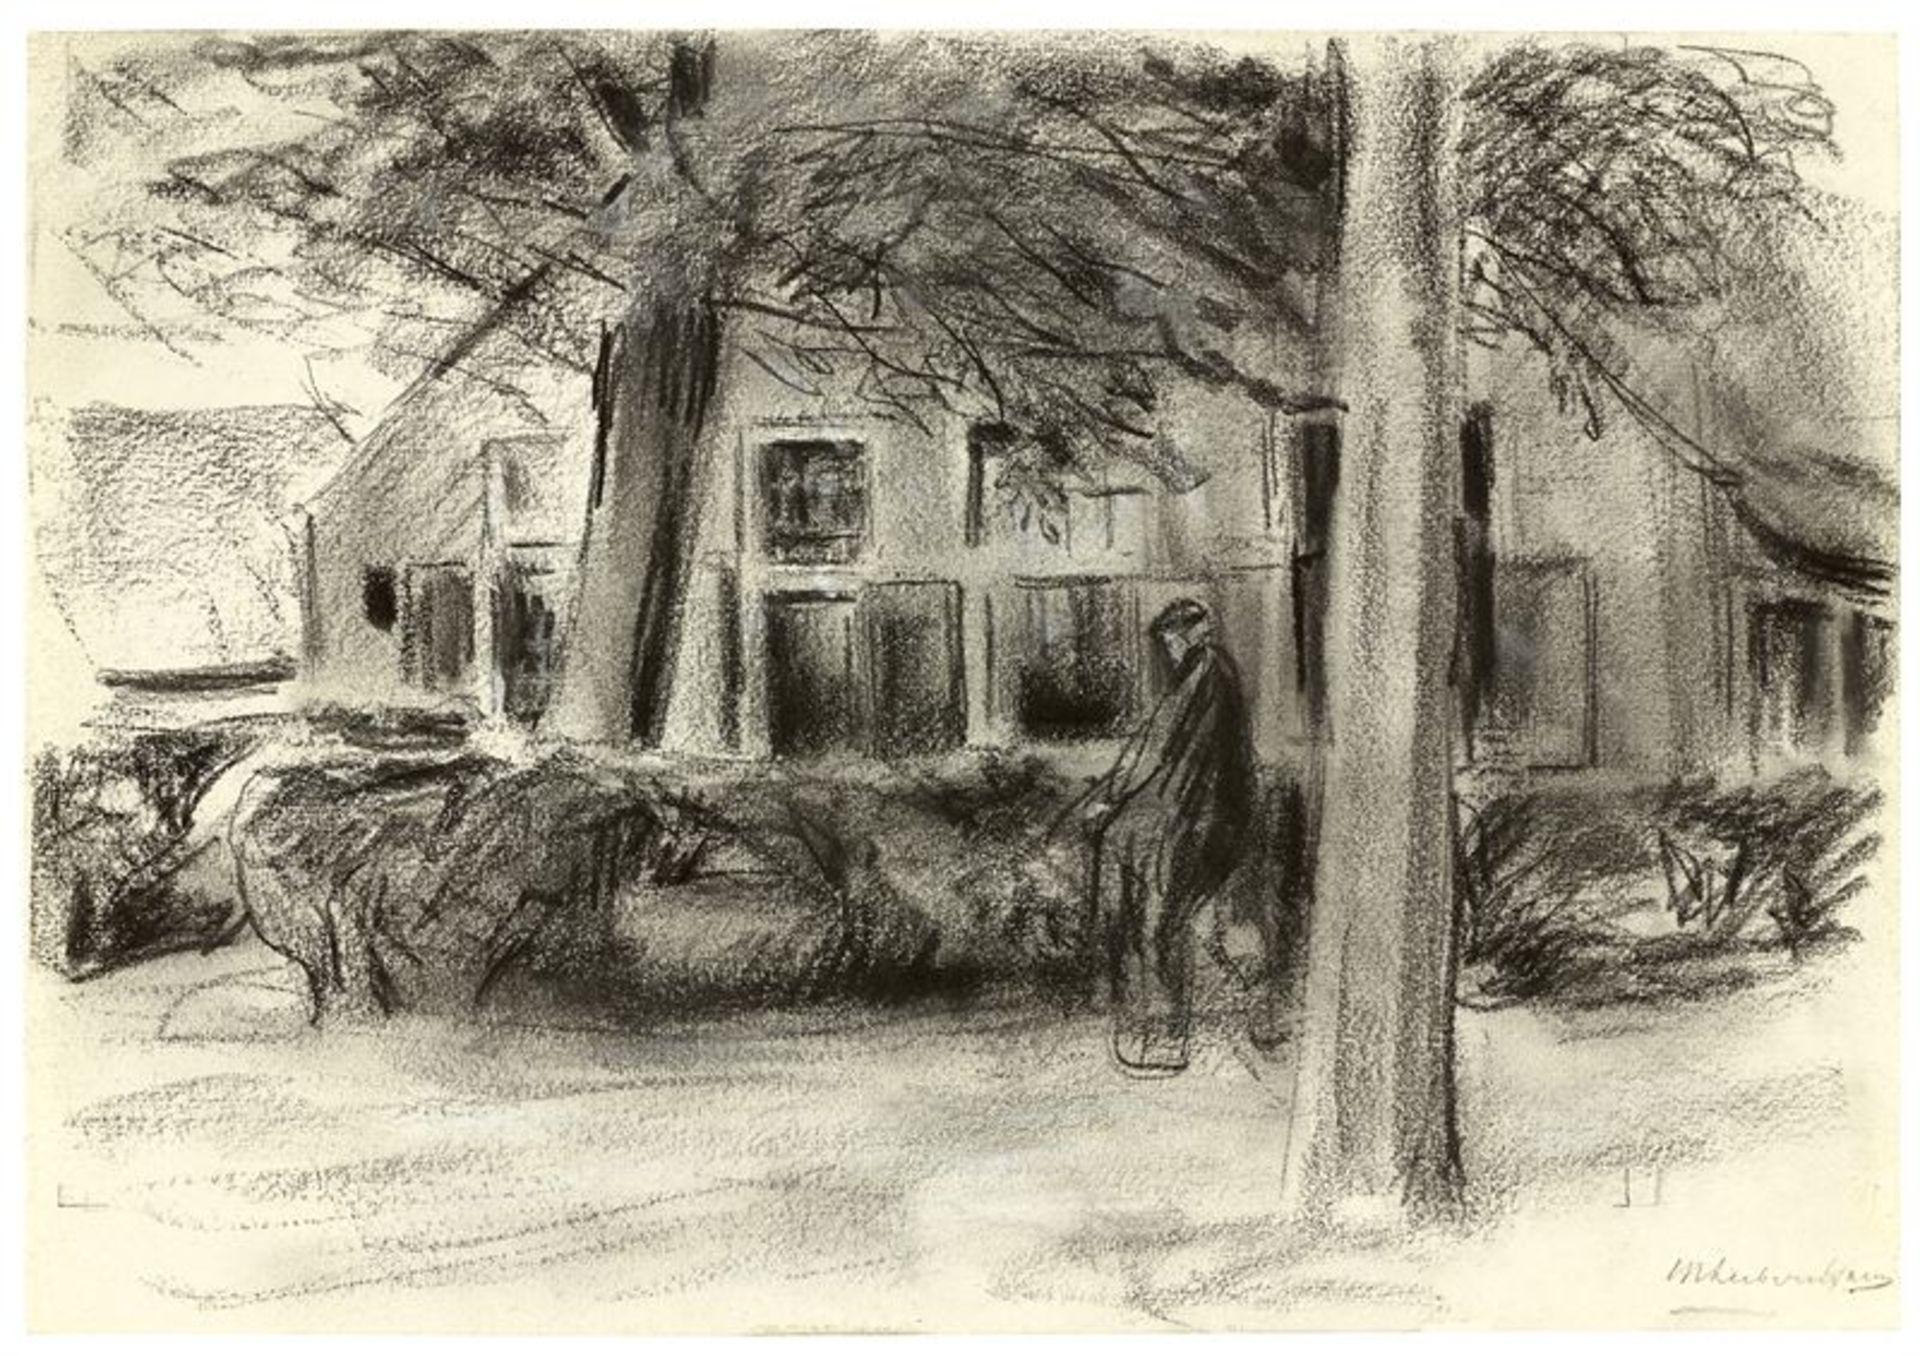 Los 117 - Max Liebermann (1847 – Berlin – 1935)